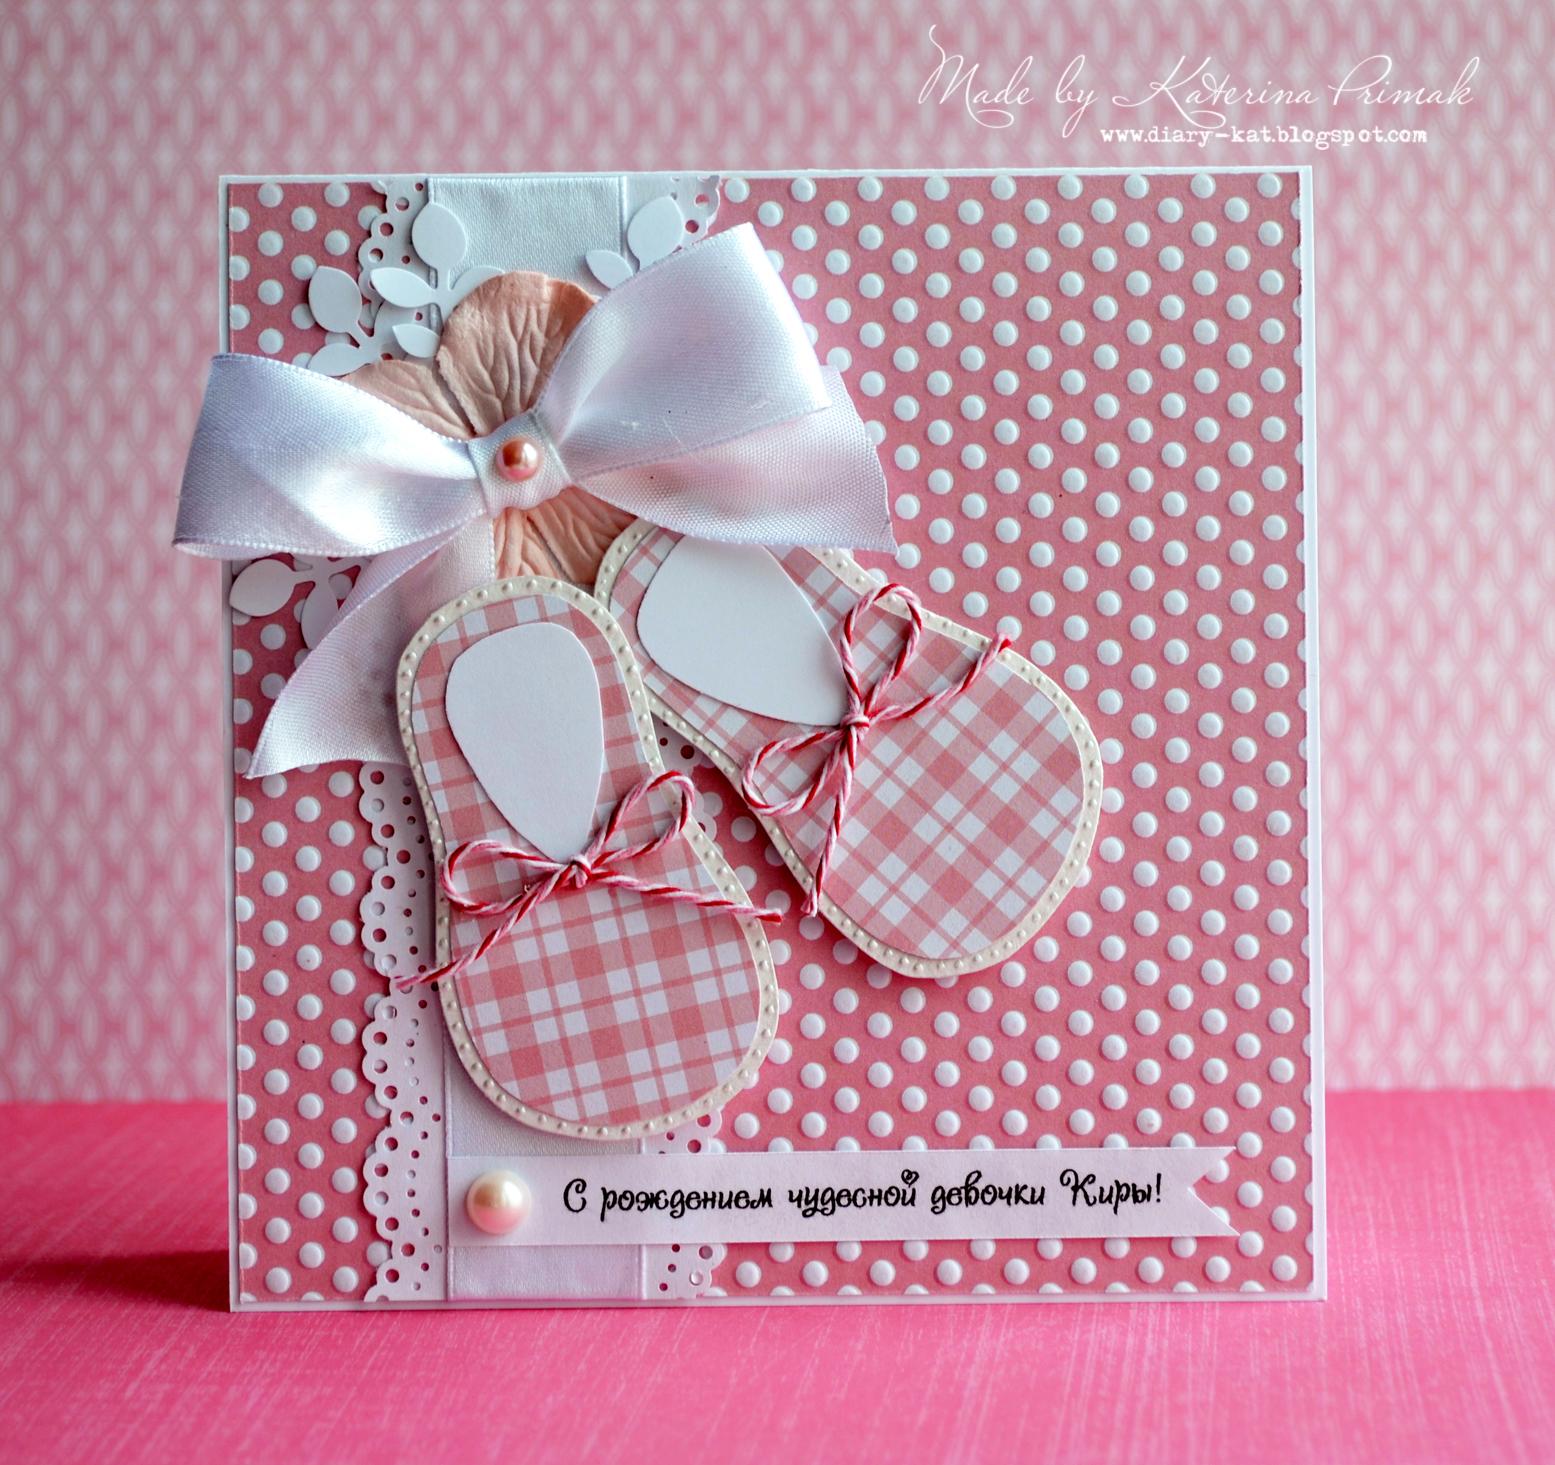 Шаблоны открыток на рождение ребенка